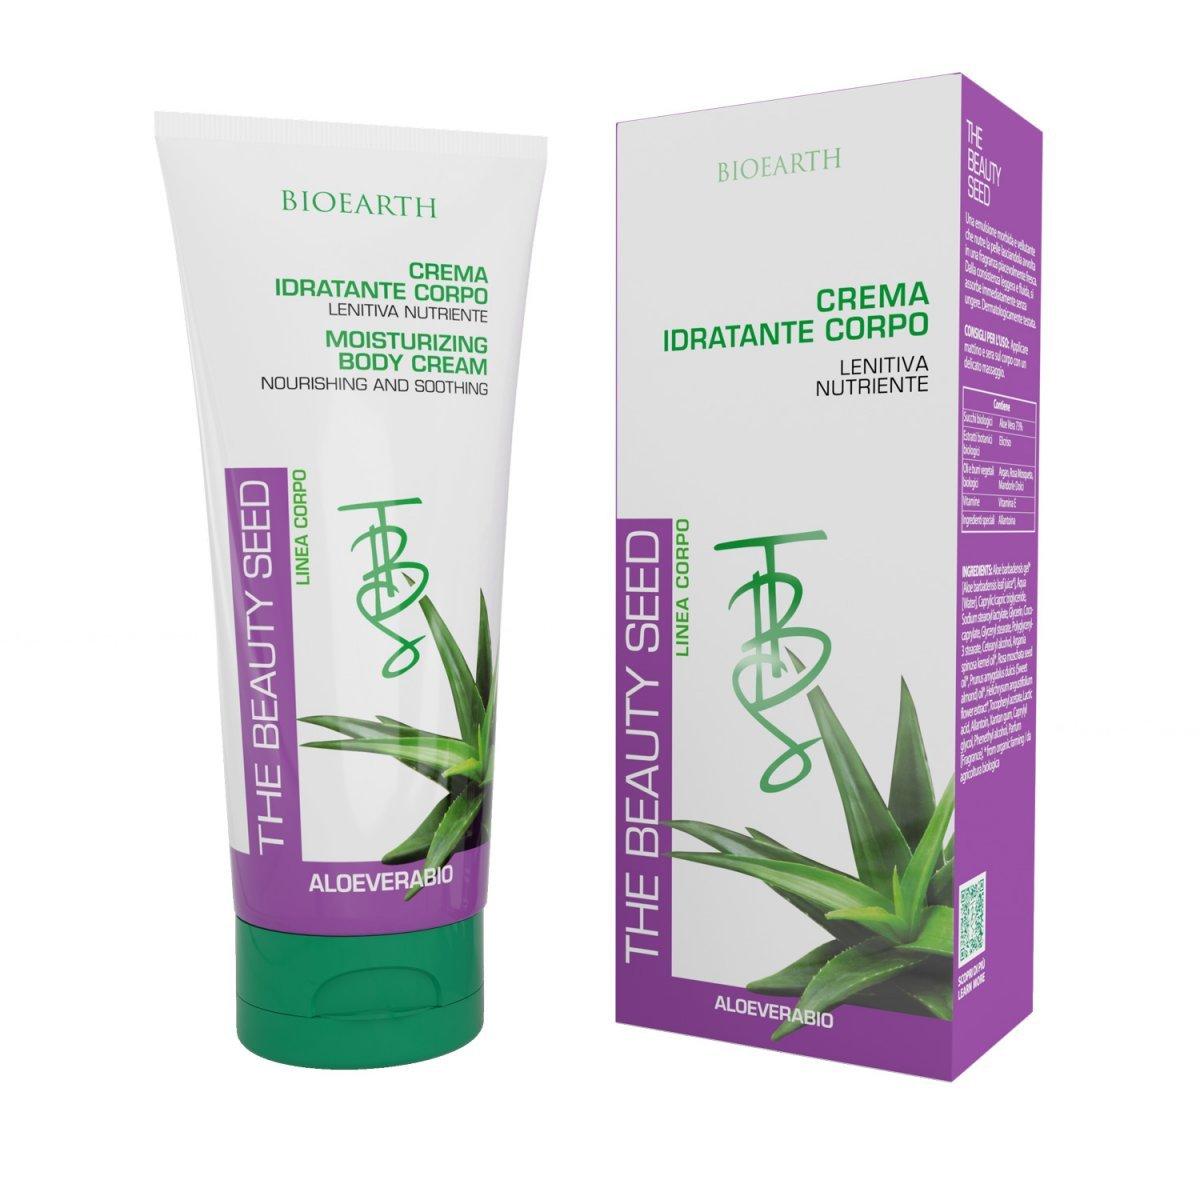 The Beauty Seed Crema Idratante Corpo all'Aloe